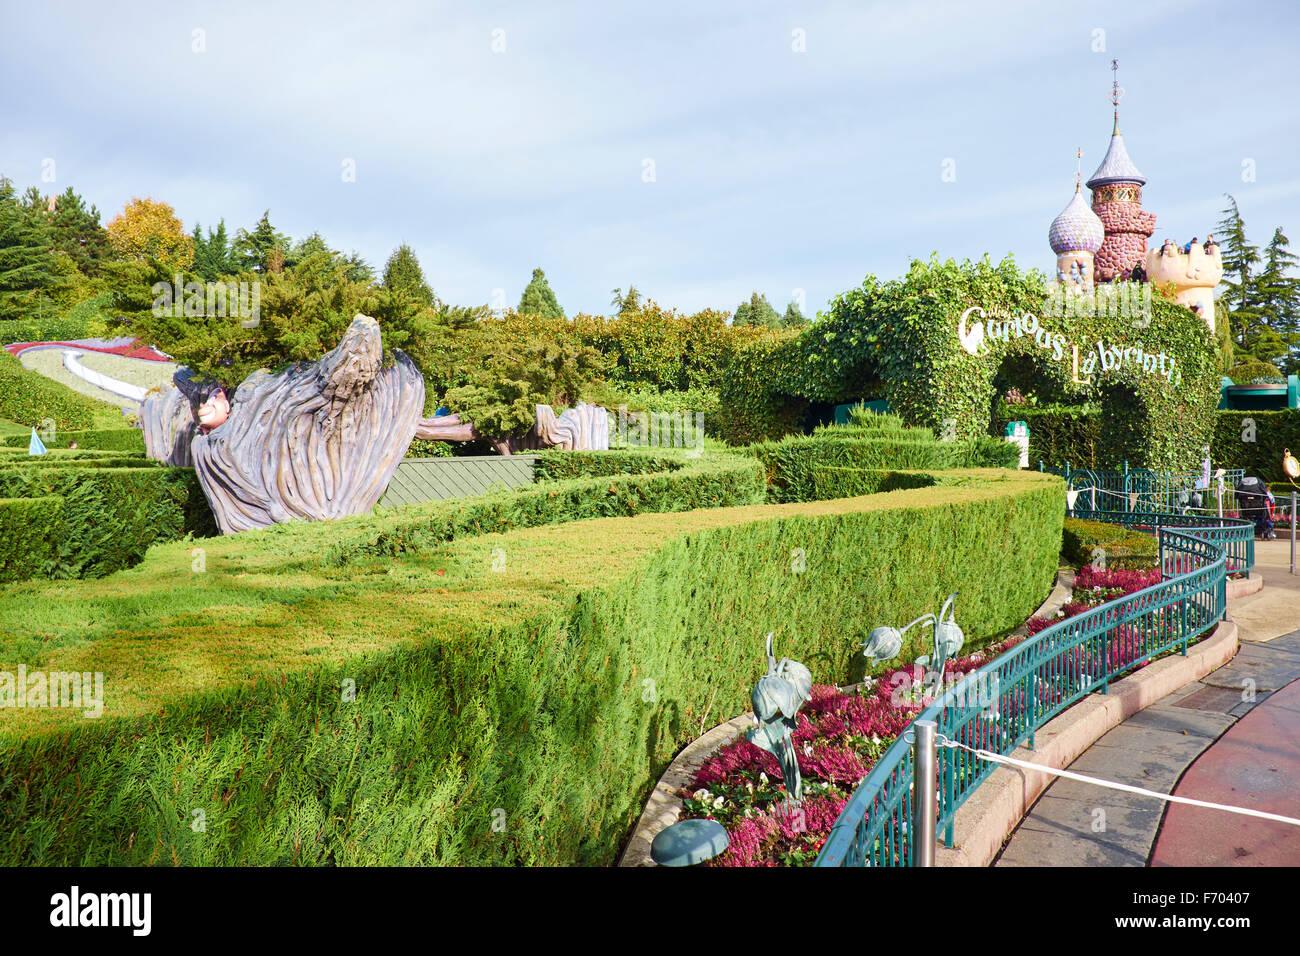 Eingang zum Alice es Curious Labyrinth im Fantasyland Disneyland Paris Marne-la-Vallée Chessy Frankreich Stockbild